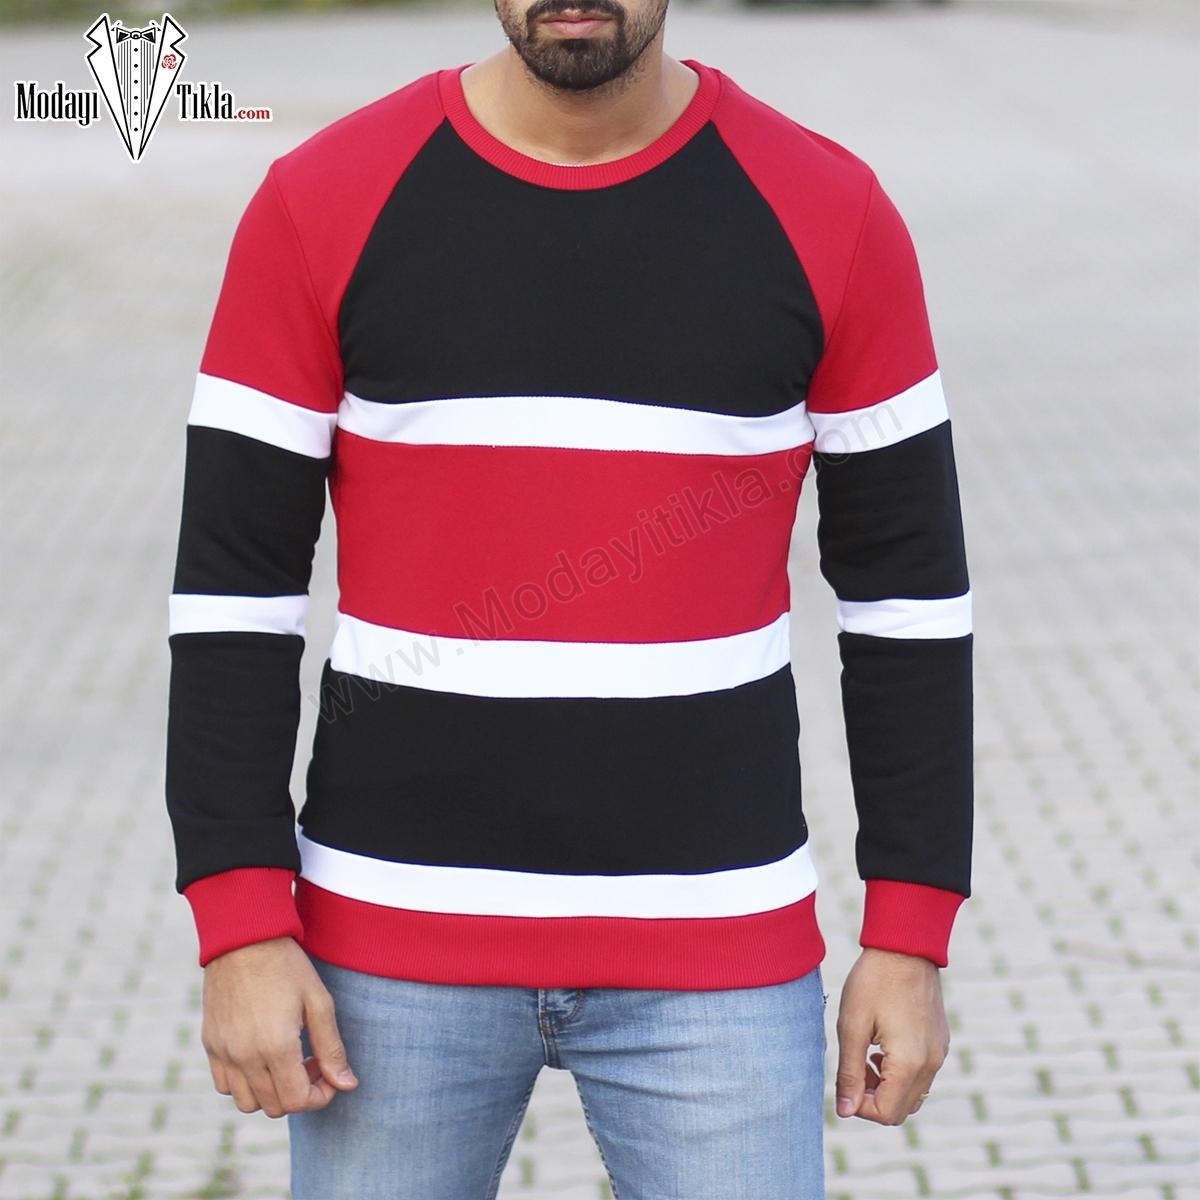 Erkek Kırmızı Siyah Sweatshirt